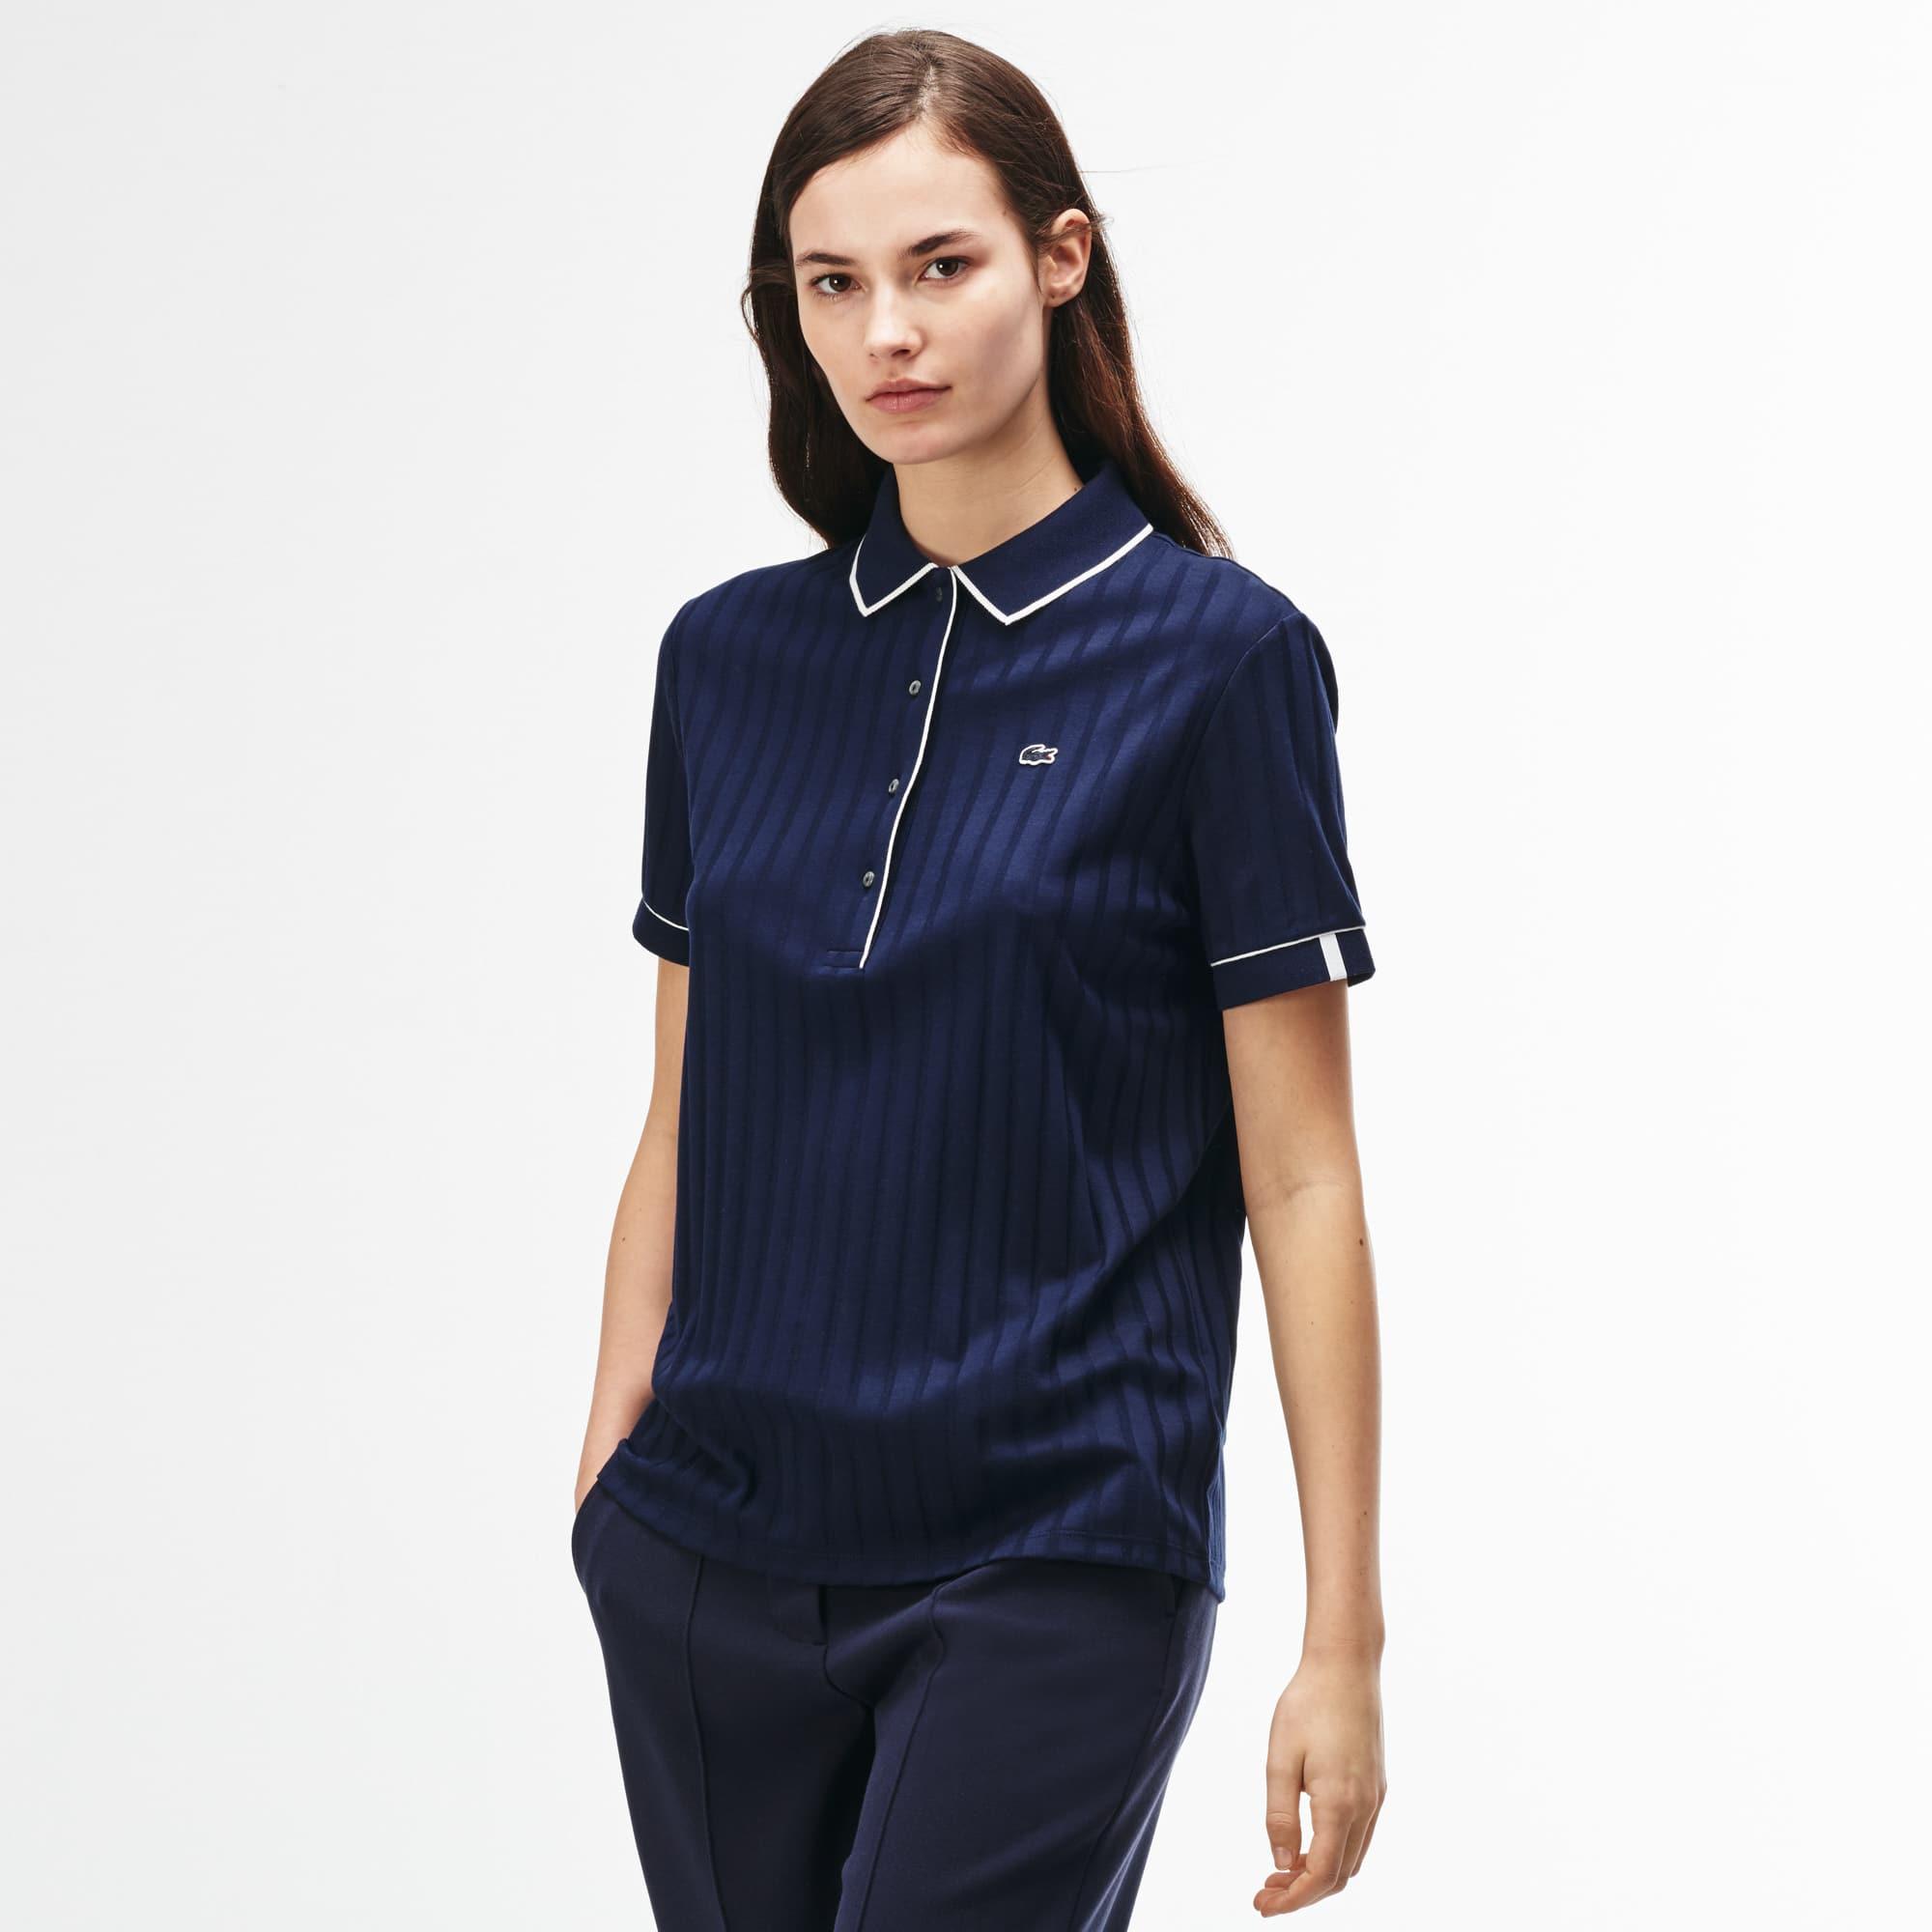 Damen-Poloshirt aus gerippter Baumwolle LACOSTE L!VE